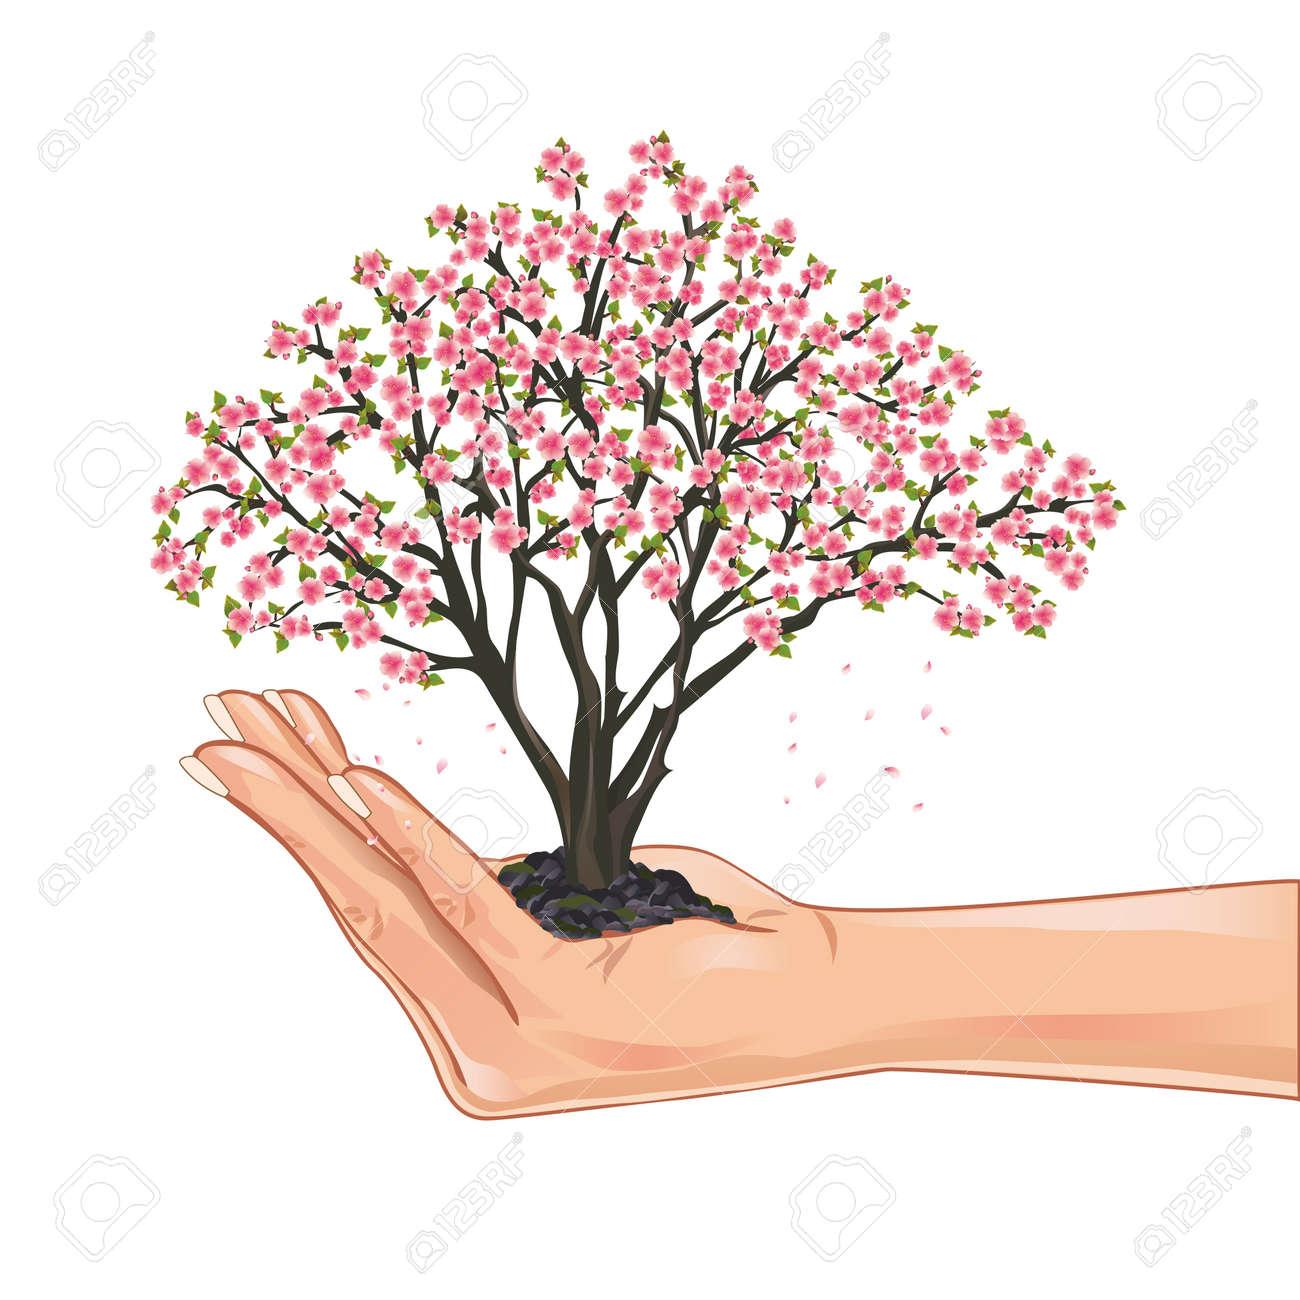 Hand holding a sakura blossom, japanese cherry tree, isolated on white background - 12482375